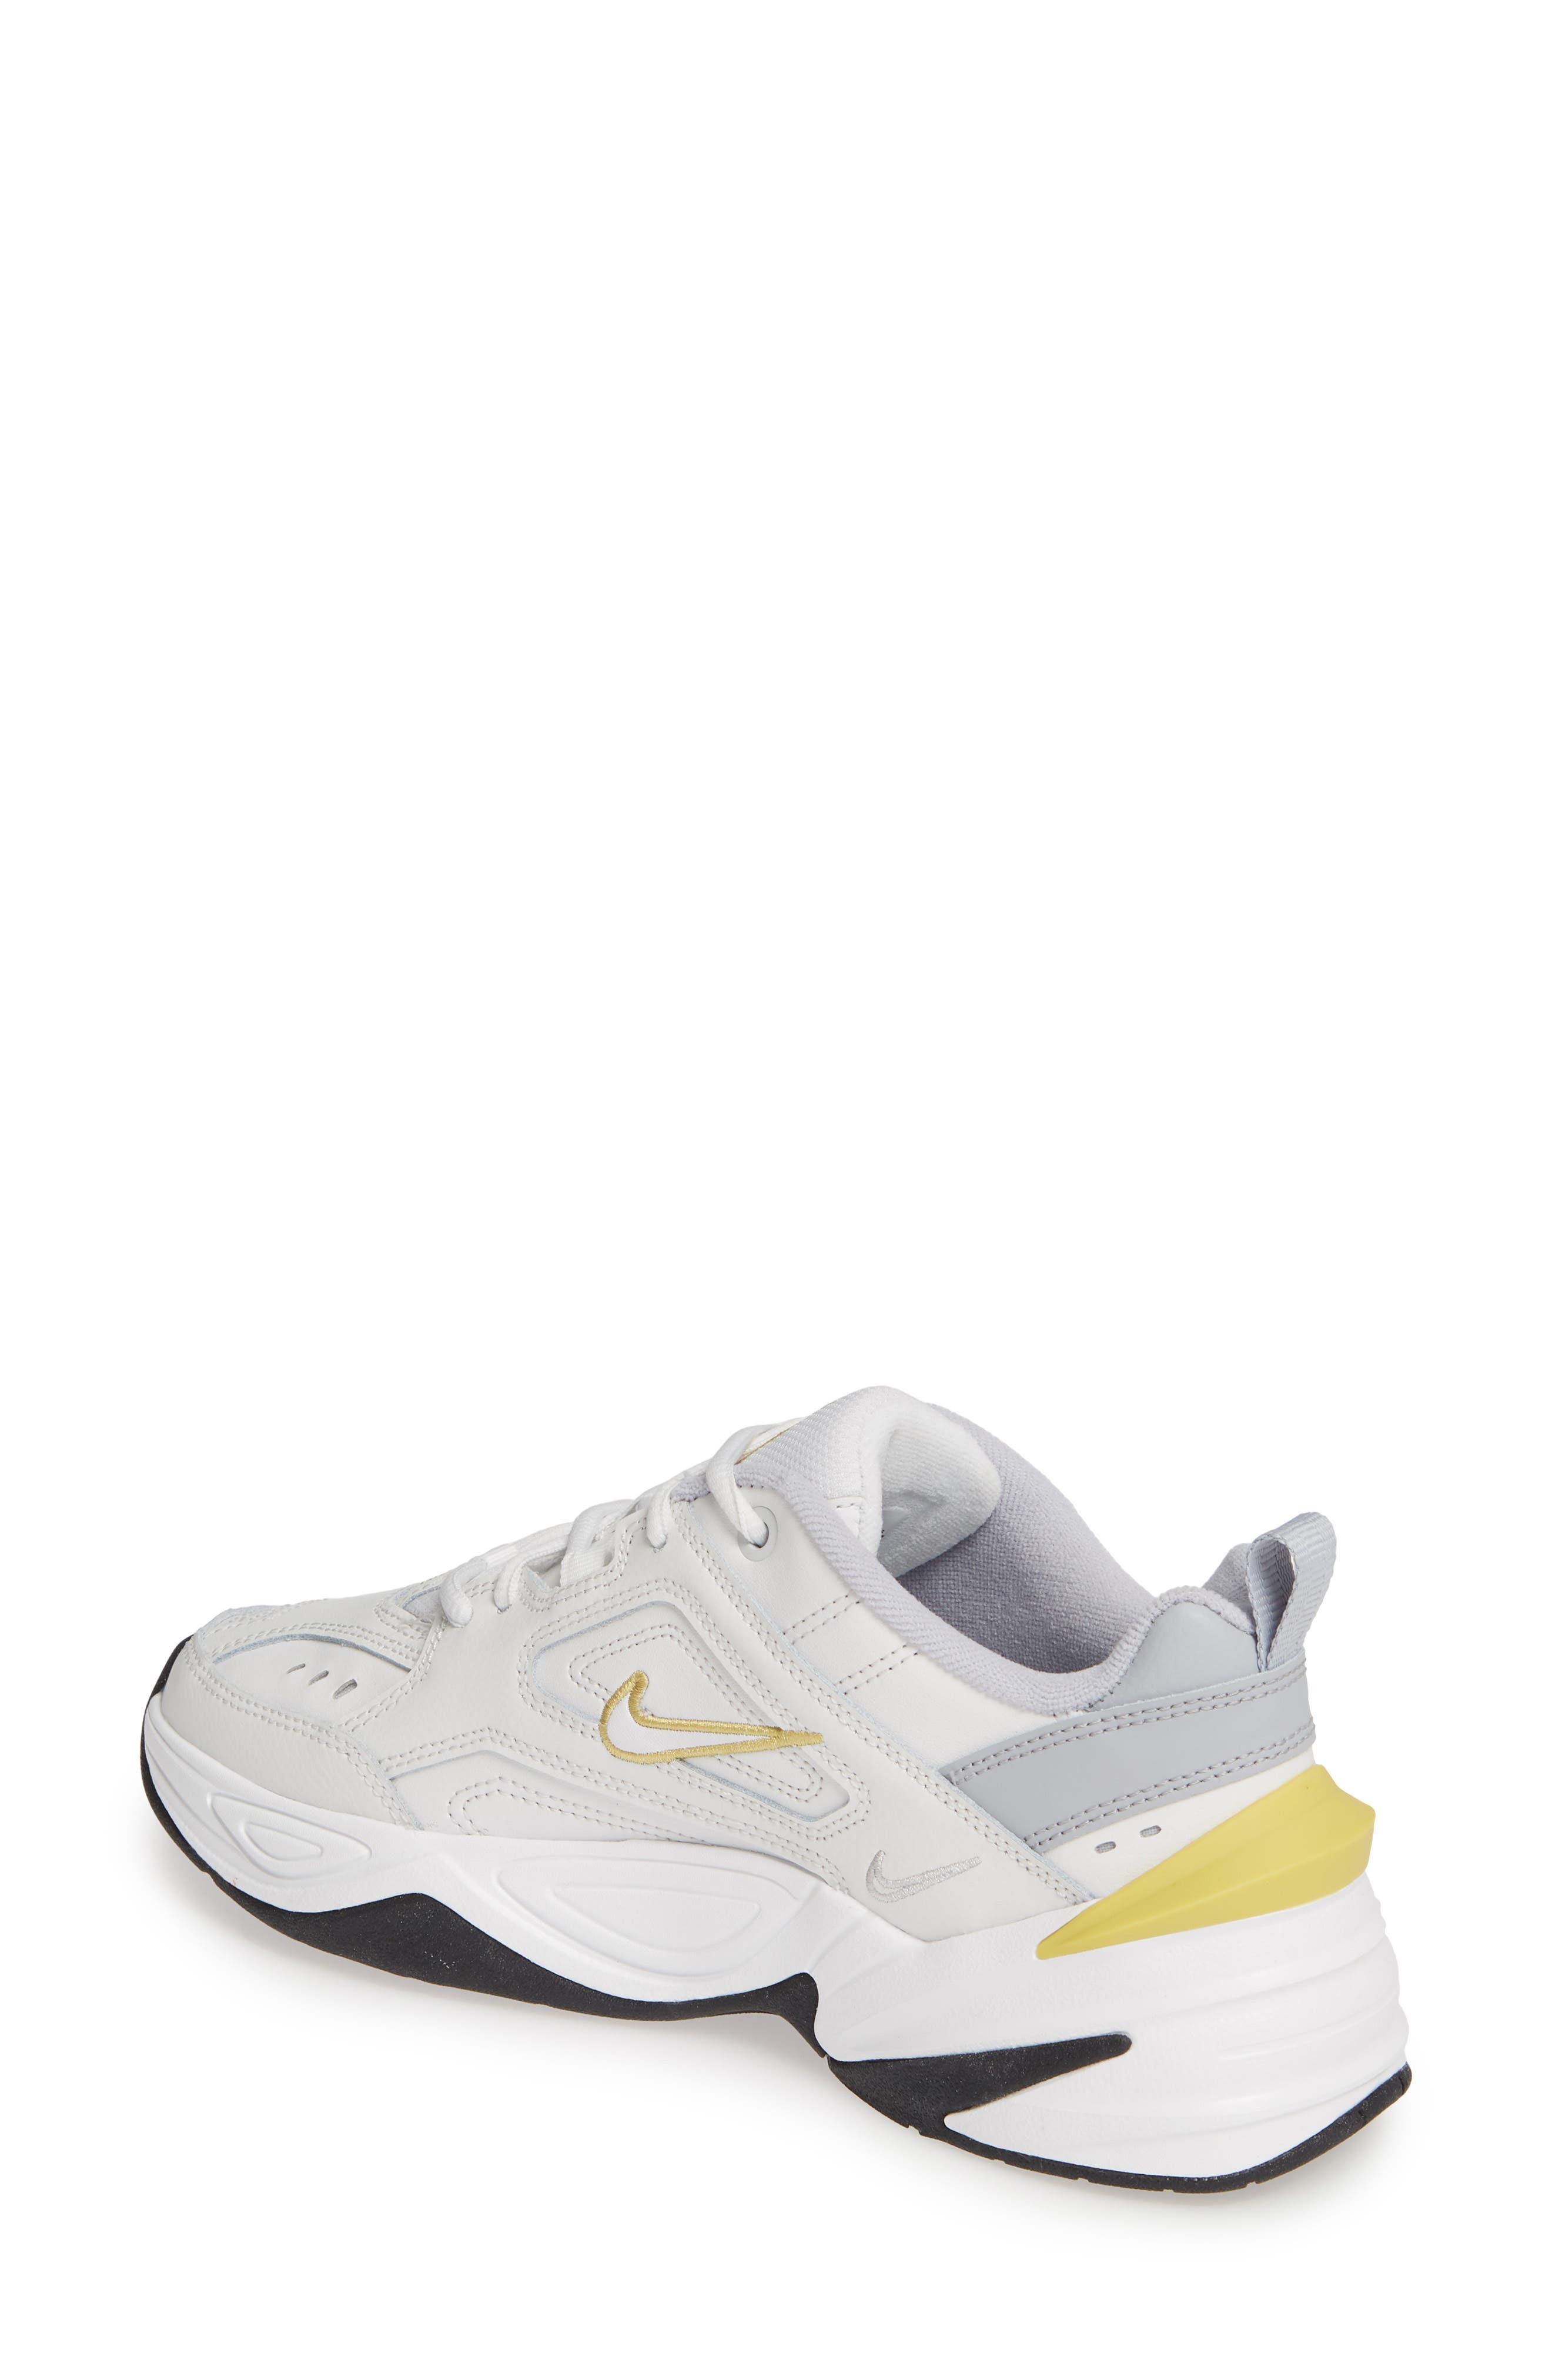 M2K Tekno Sneaker,                             Alternate thumbnail 2, color,                             PLATINUM TINT/ CELERY/ GREY